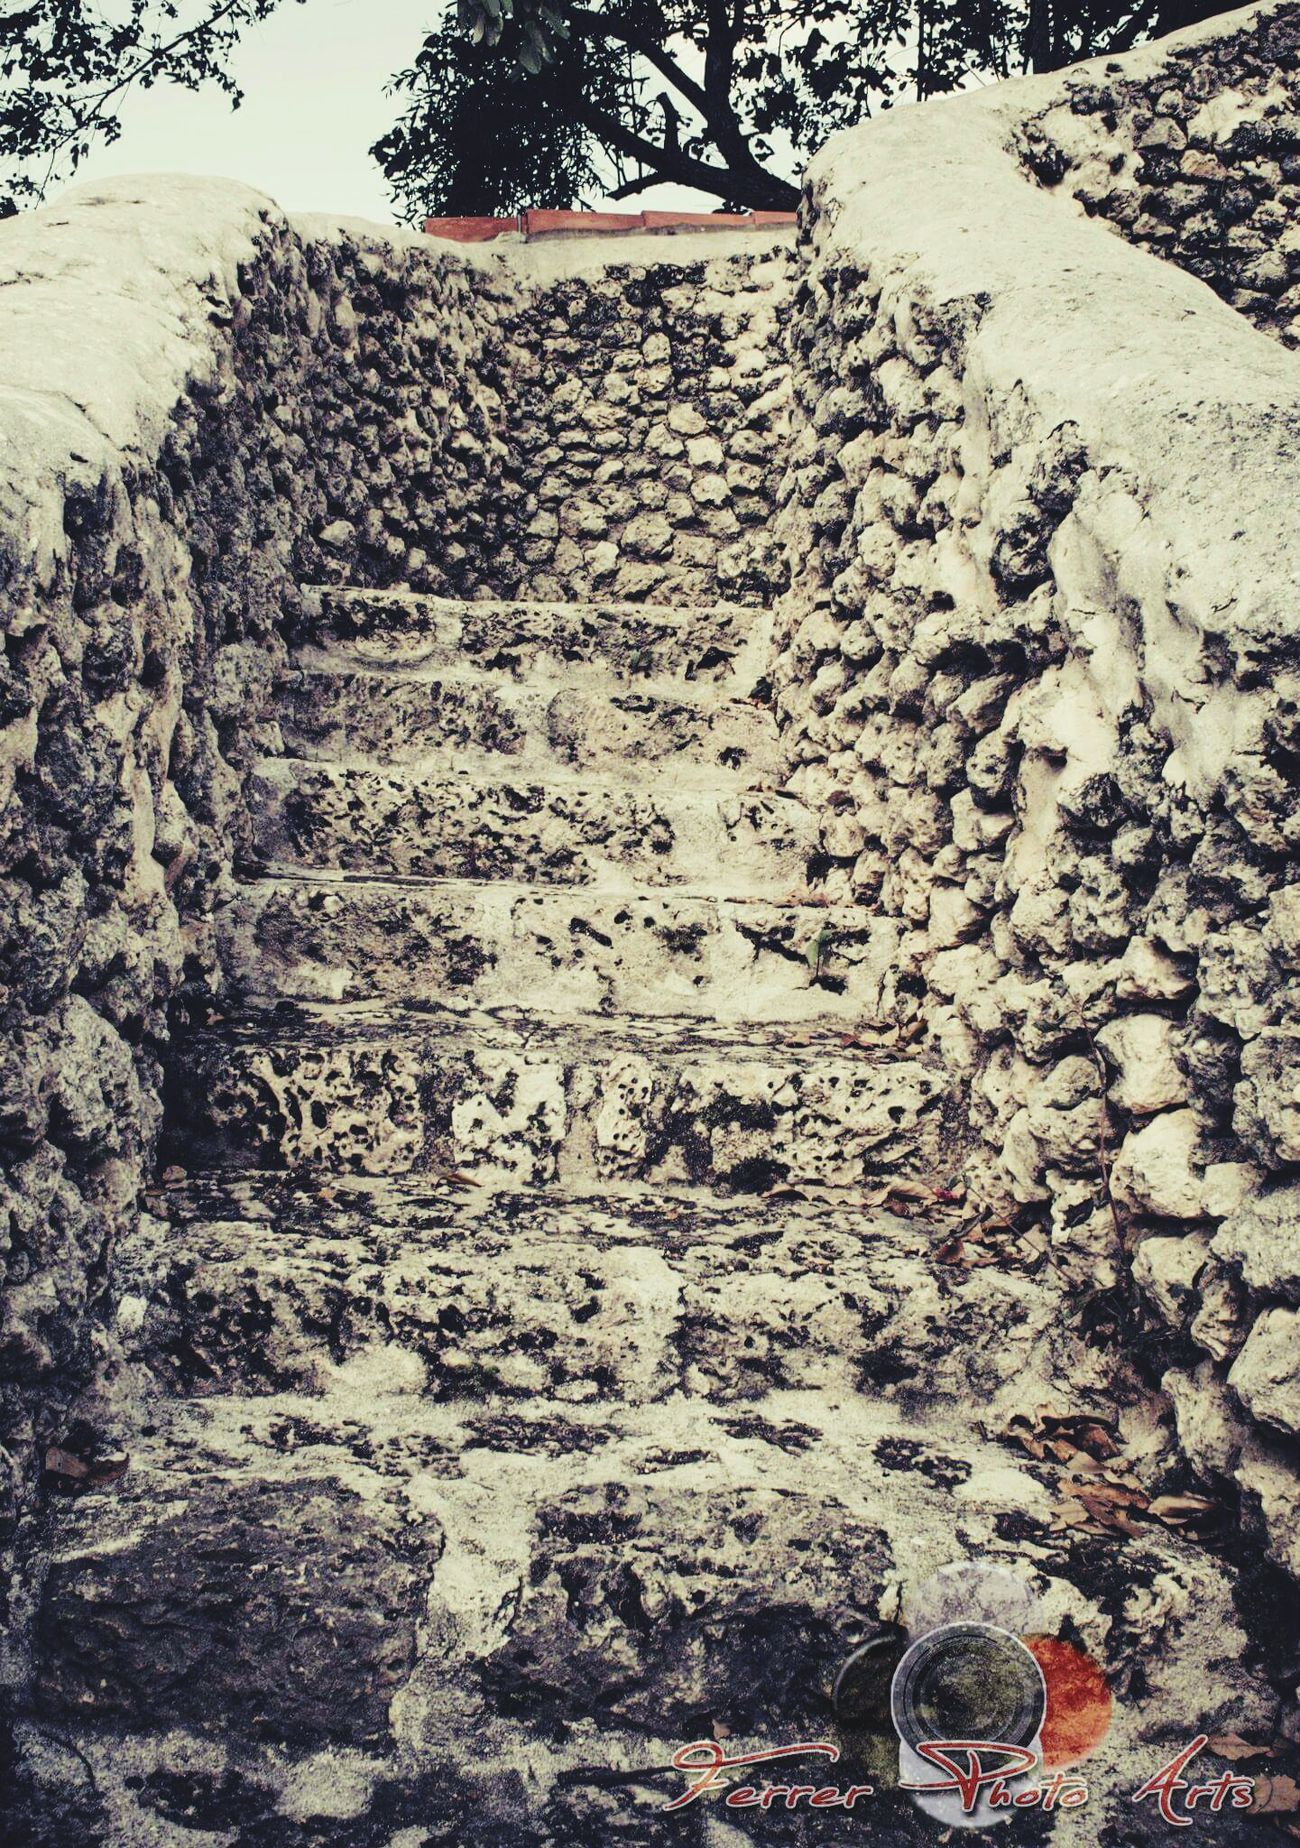 Stairways Altosdechavon Escaleras Republica Dominicana Subir Viaje Nikonphotography Street Photography